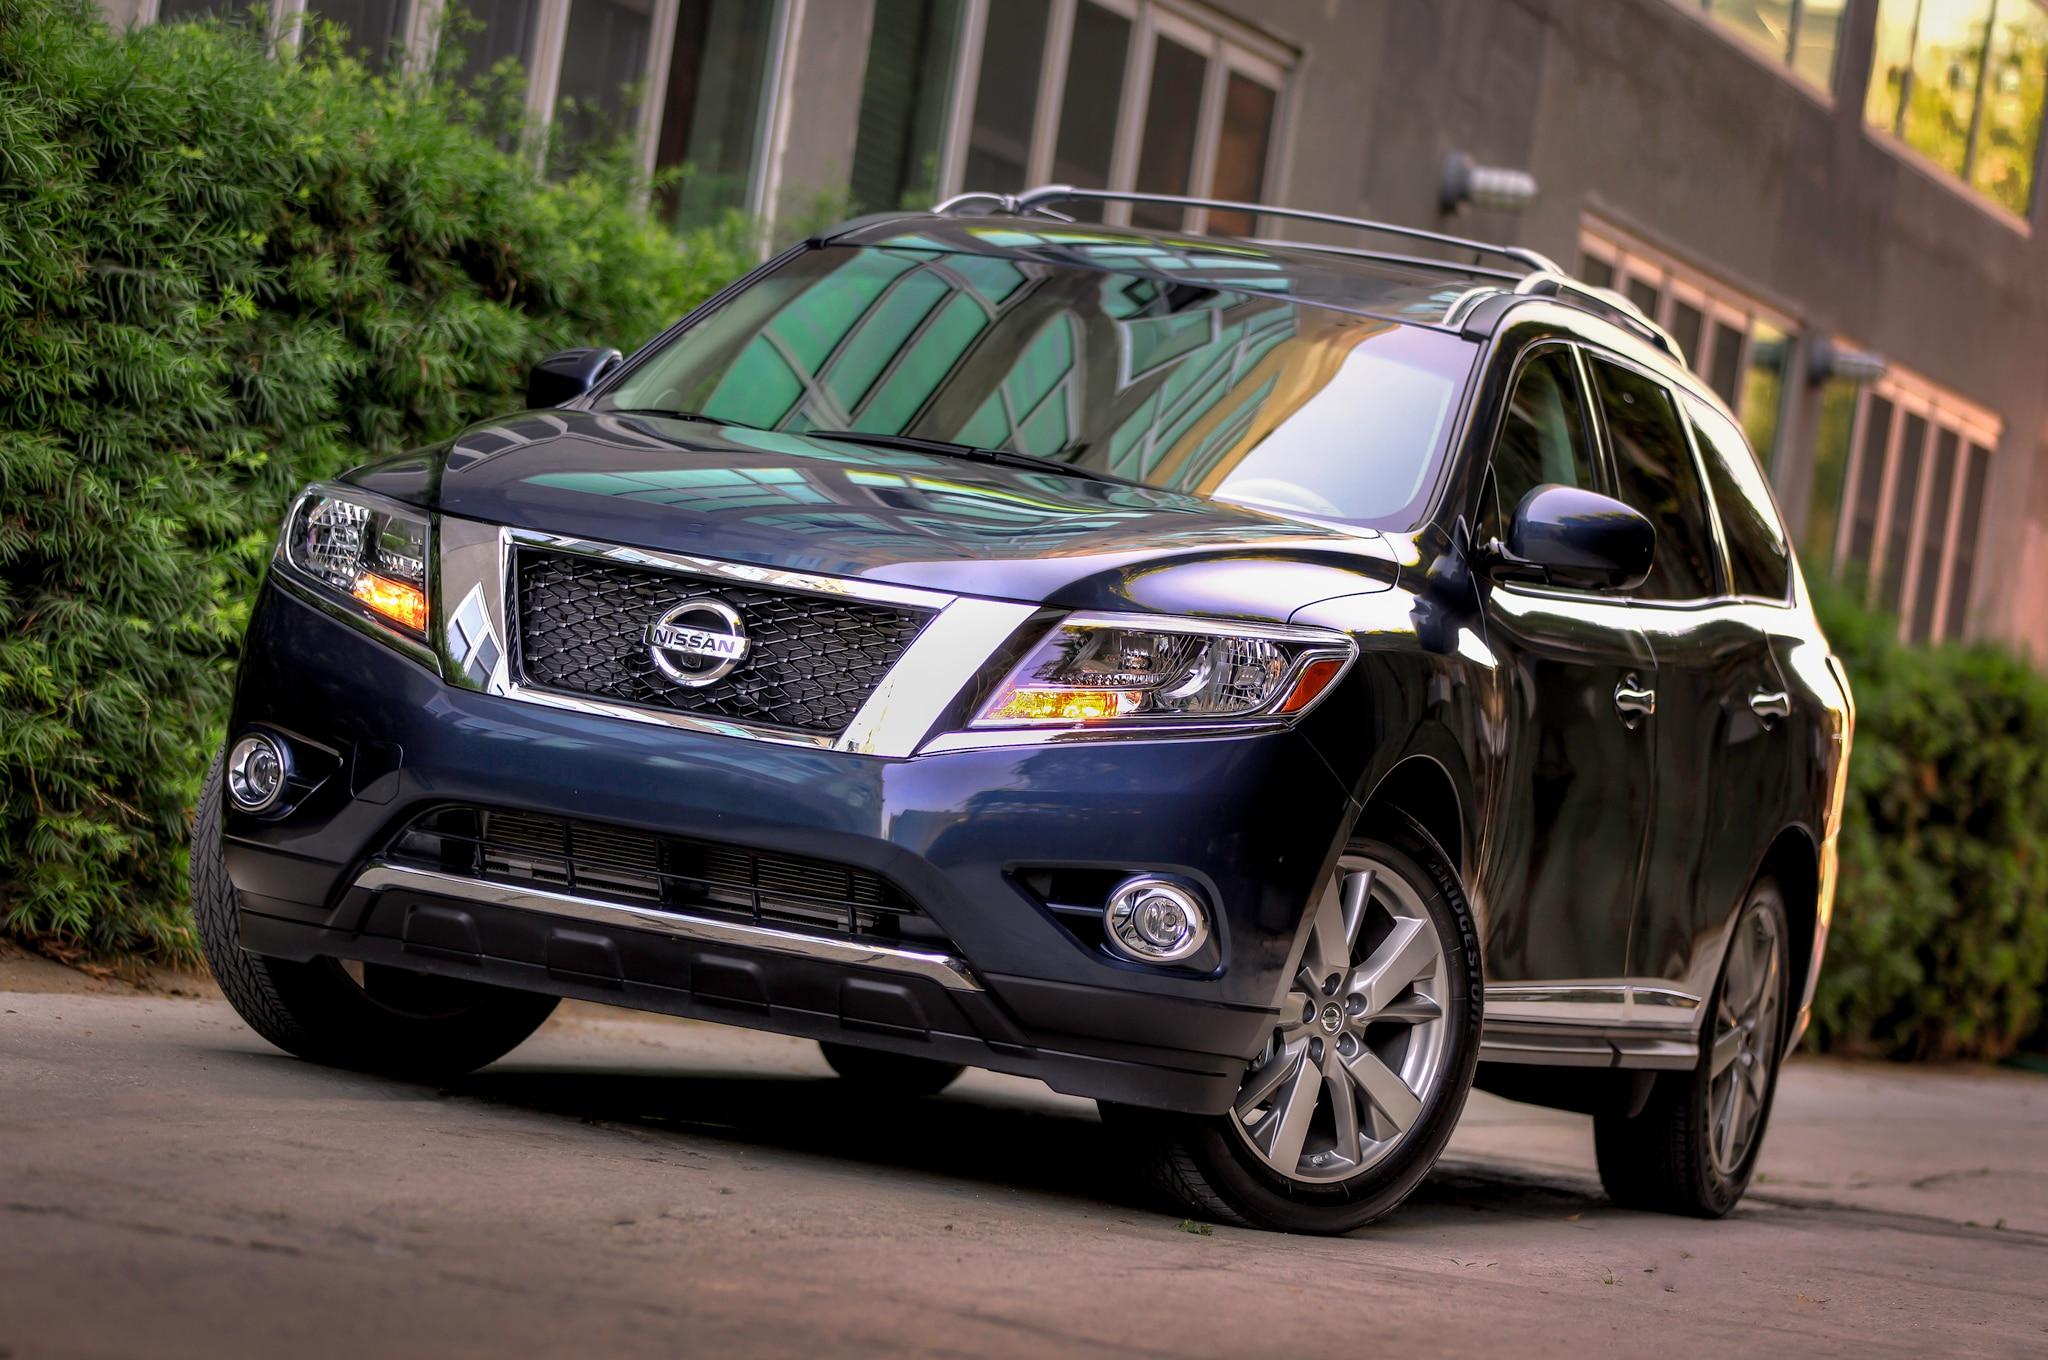 2014 Nissan Pathfinder Front Three Quarters1